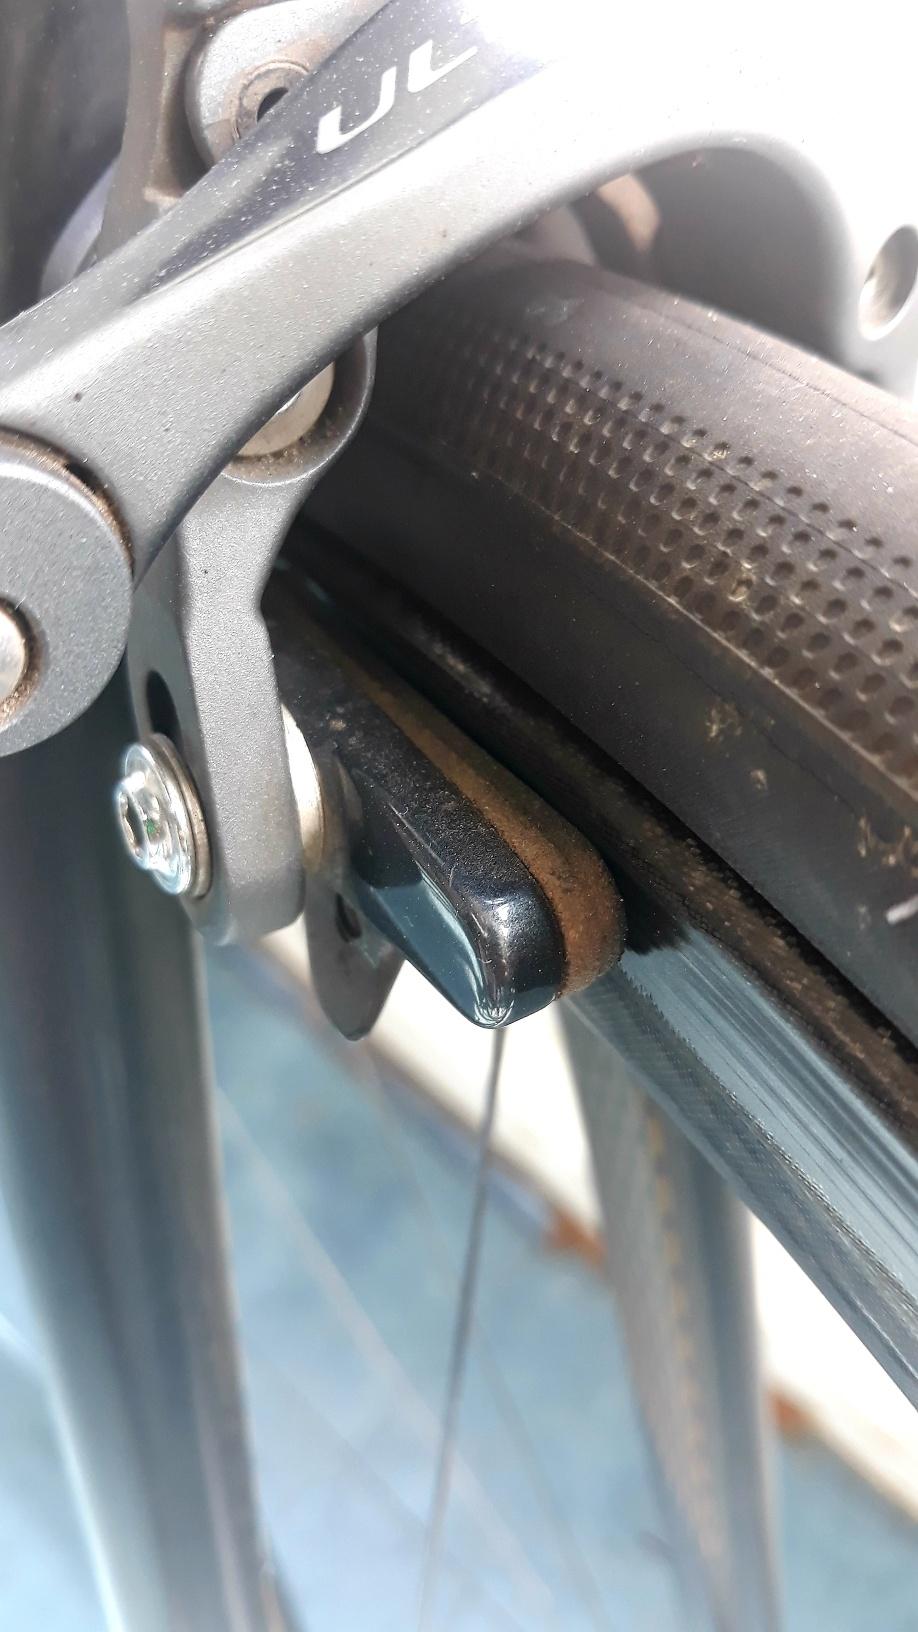 Chequeo preparón a tu bicicleta